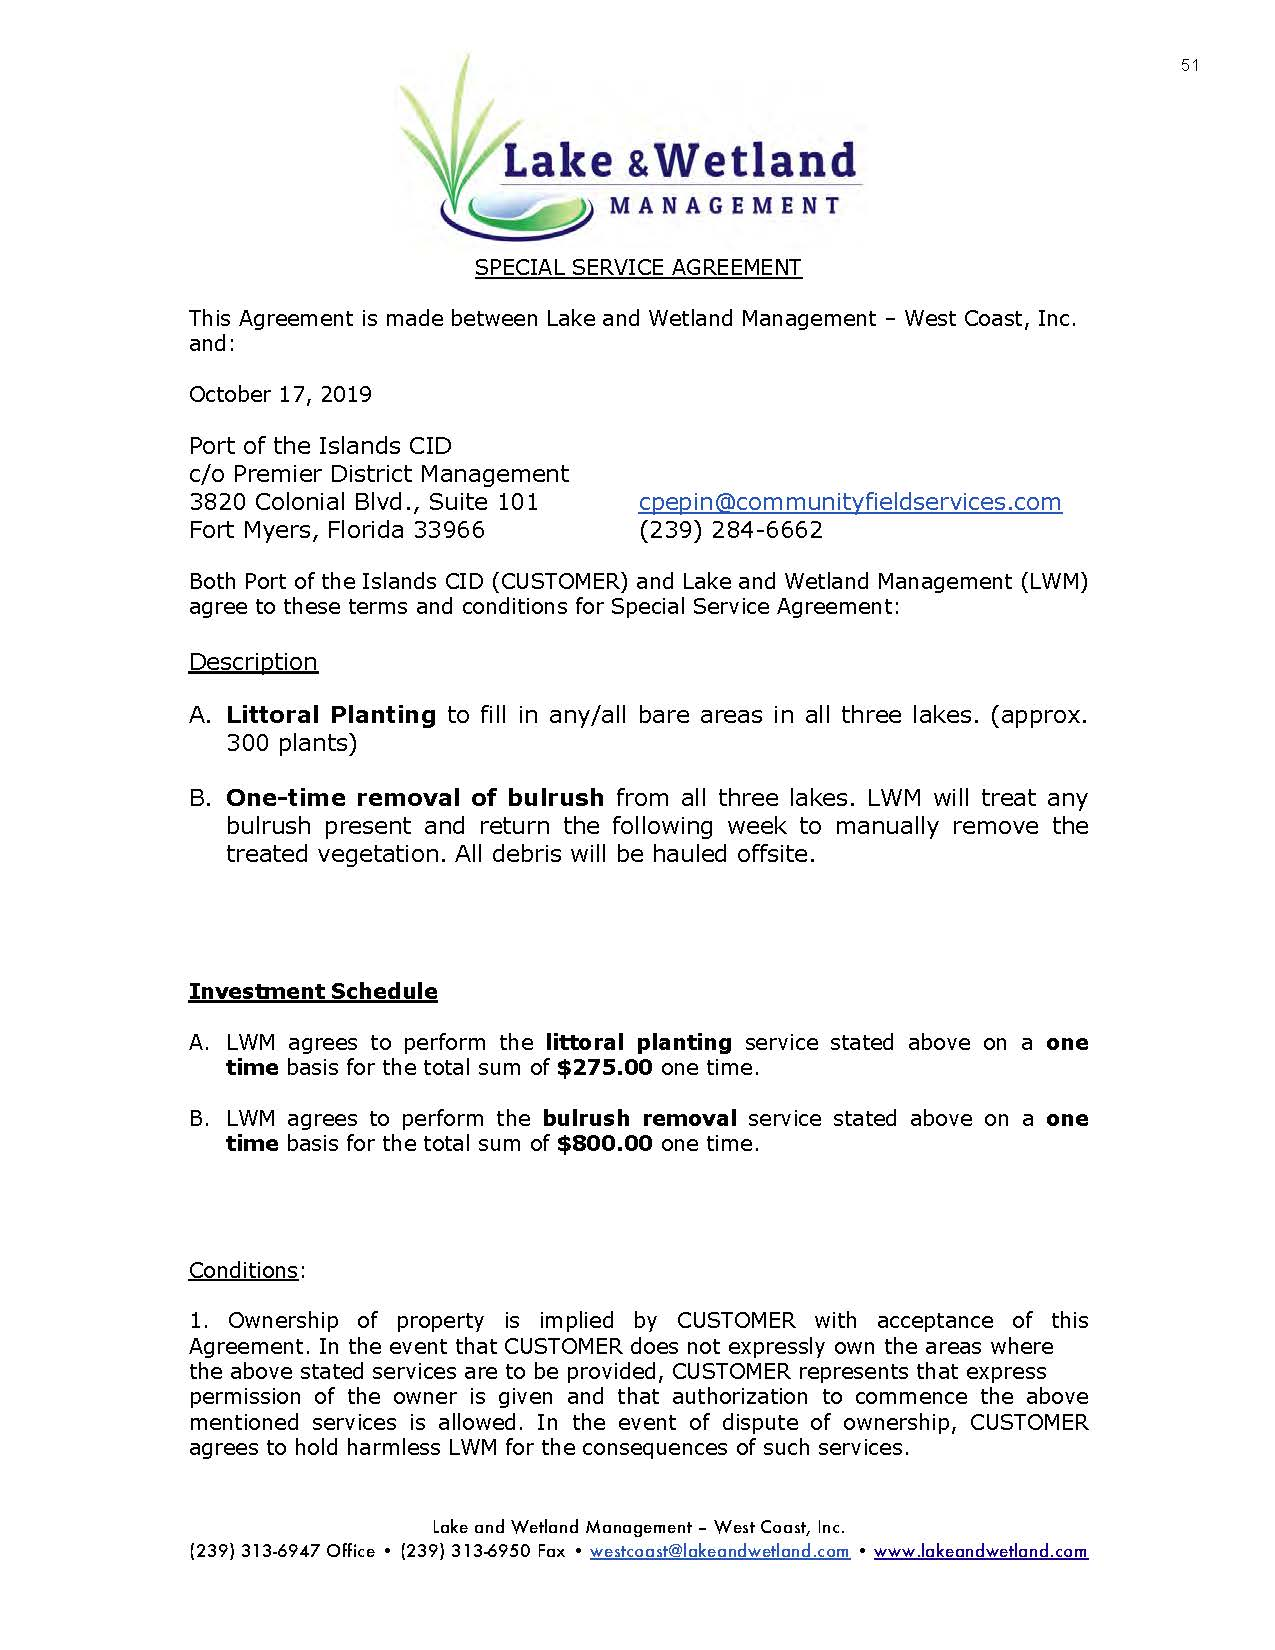 Lake & Wetlands Management Special Service Agreement